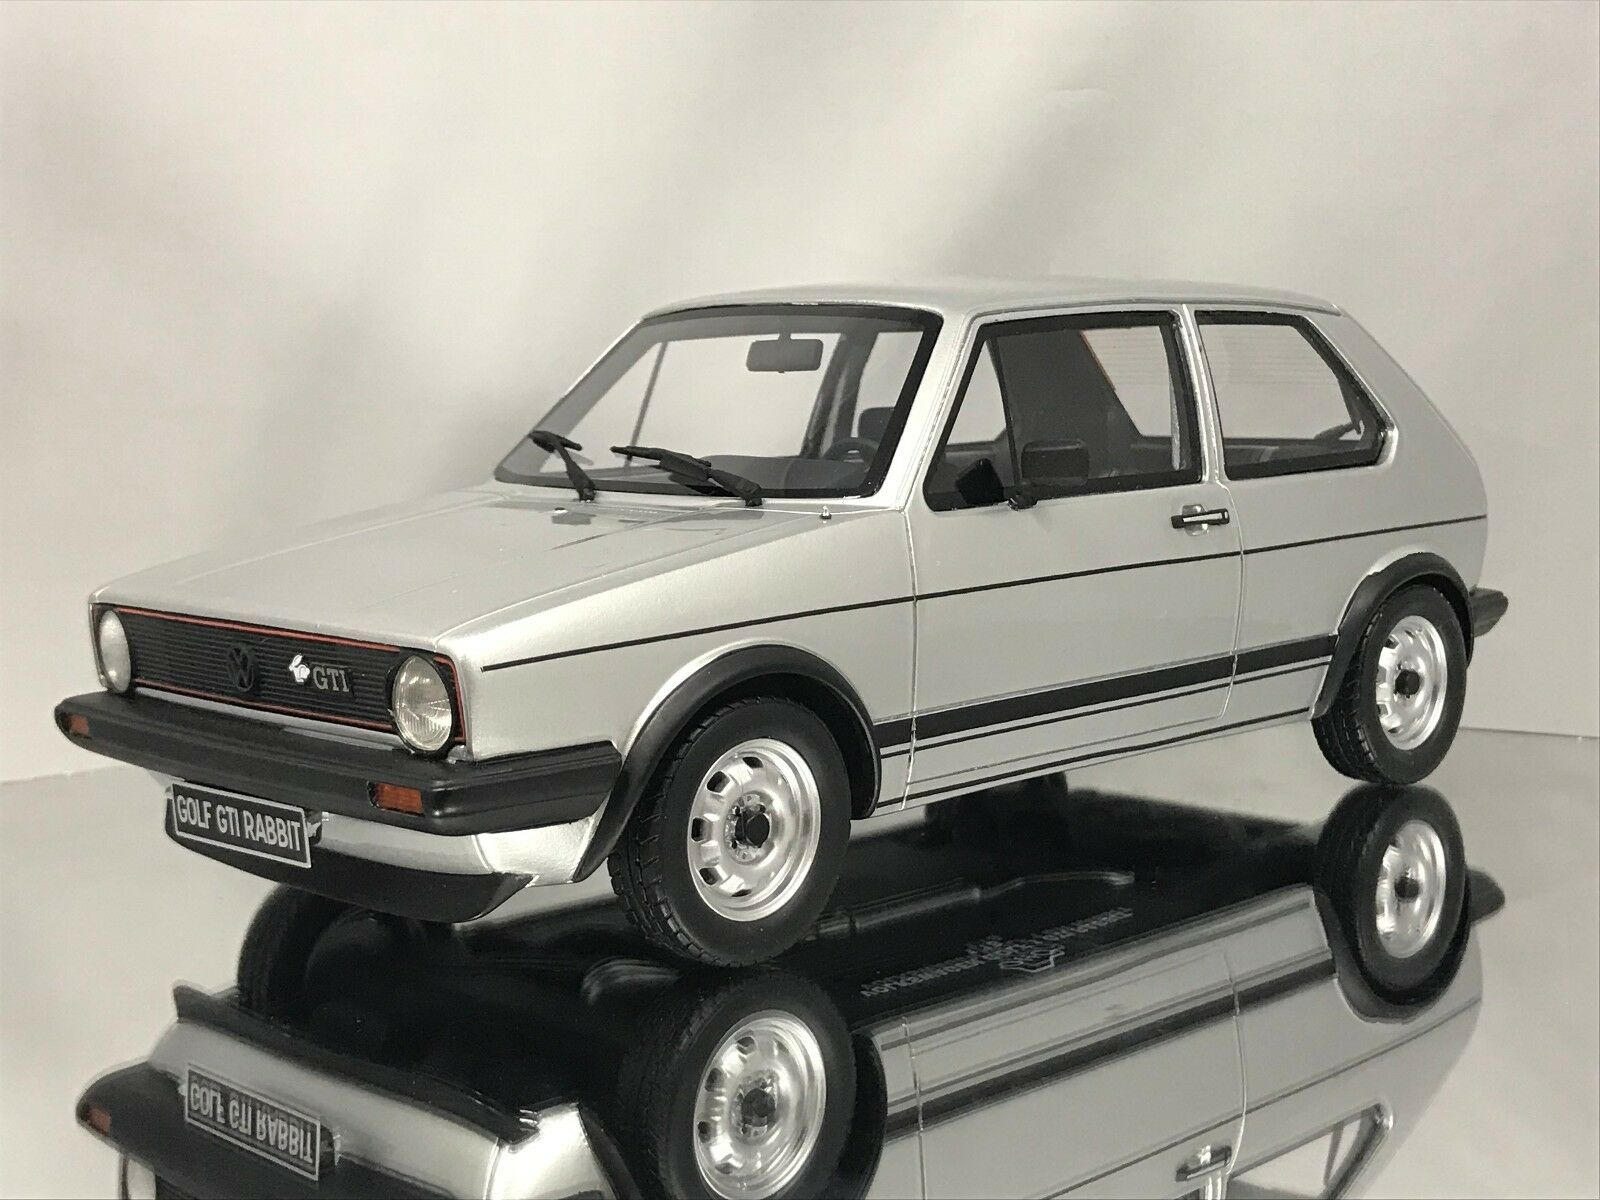 Otto Mobile Ottomobile Vw Volkswagen Golf I Mk1 Gti Rabbit Silver Resin Car 1 18 For Sale Online